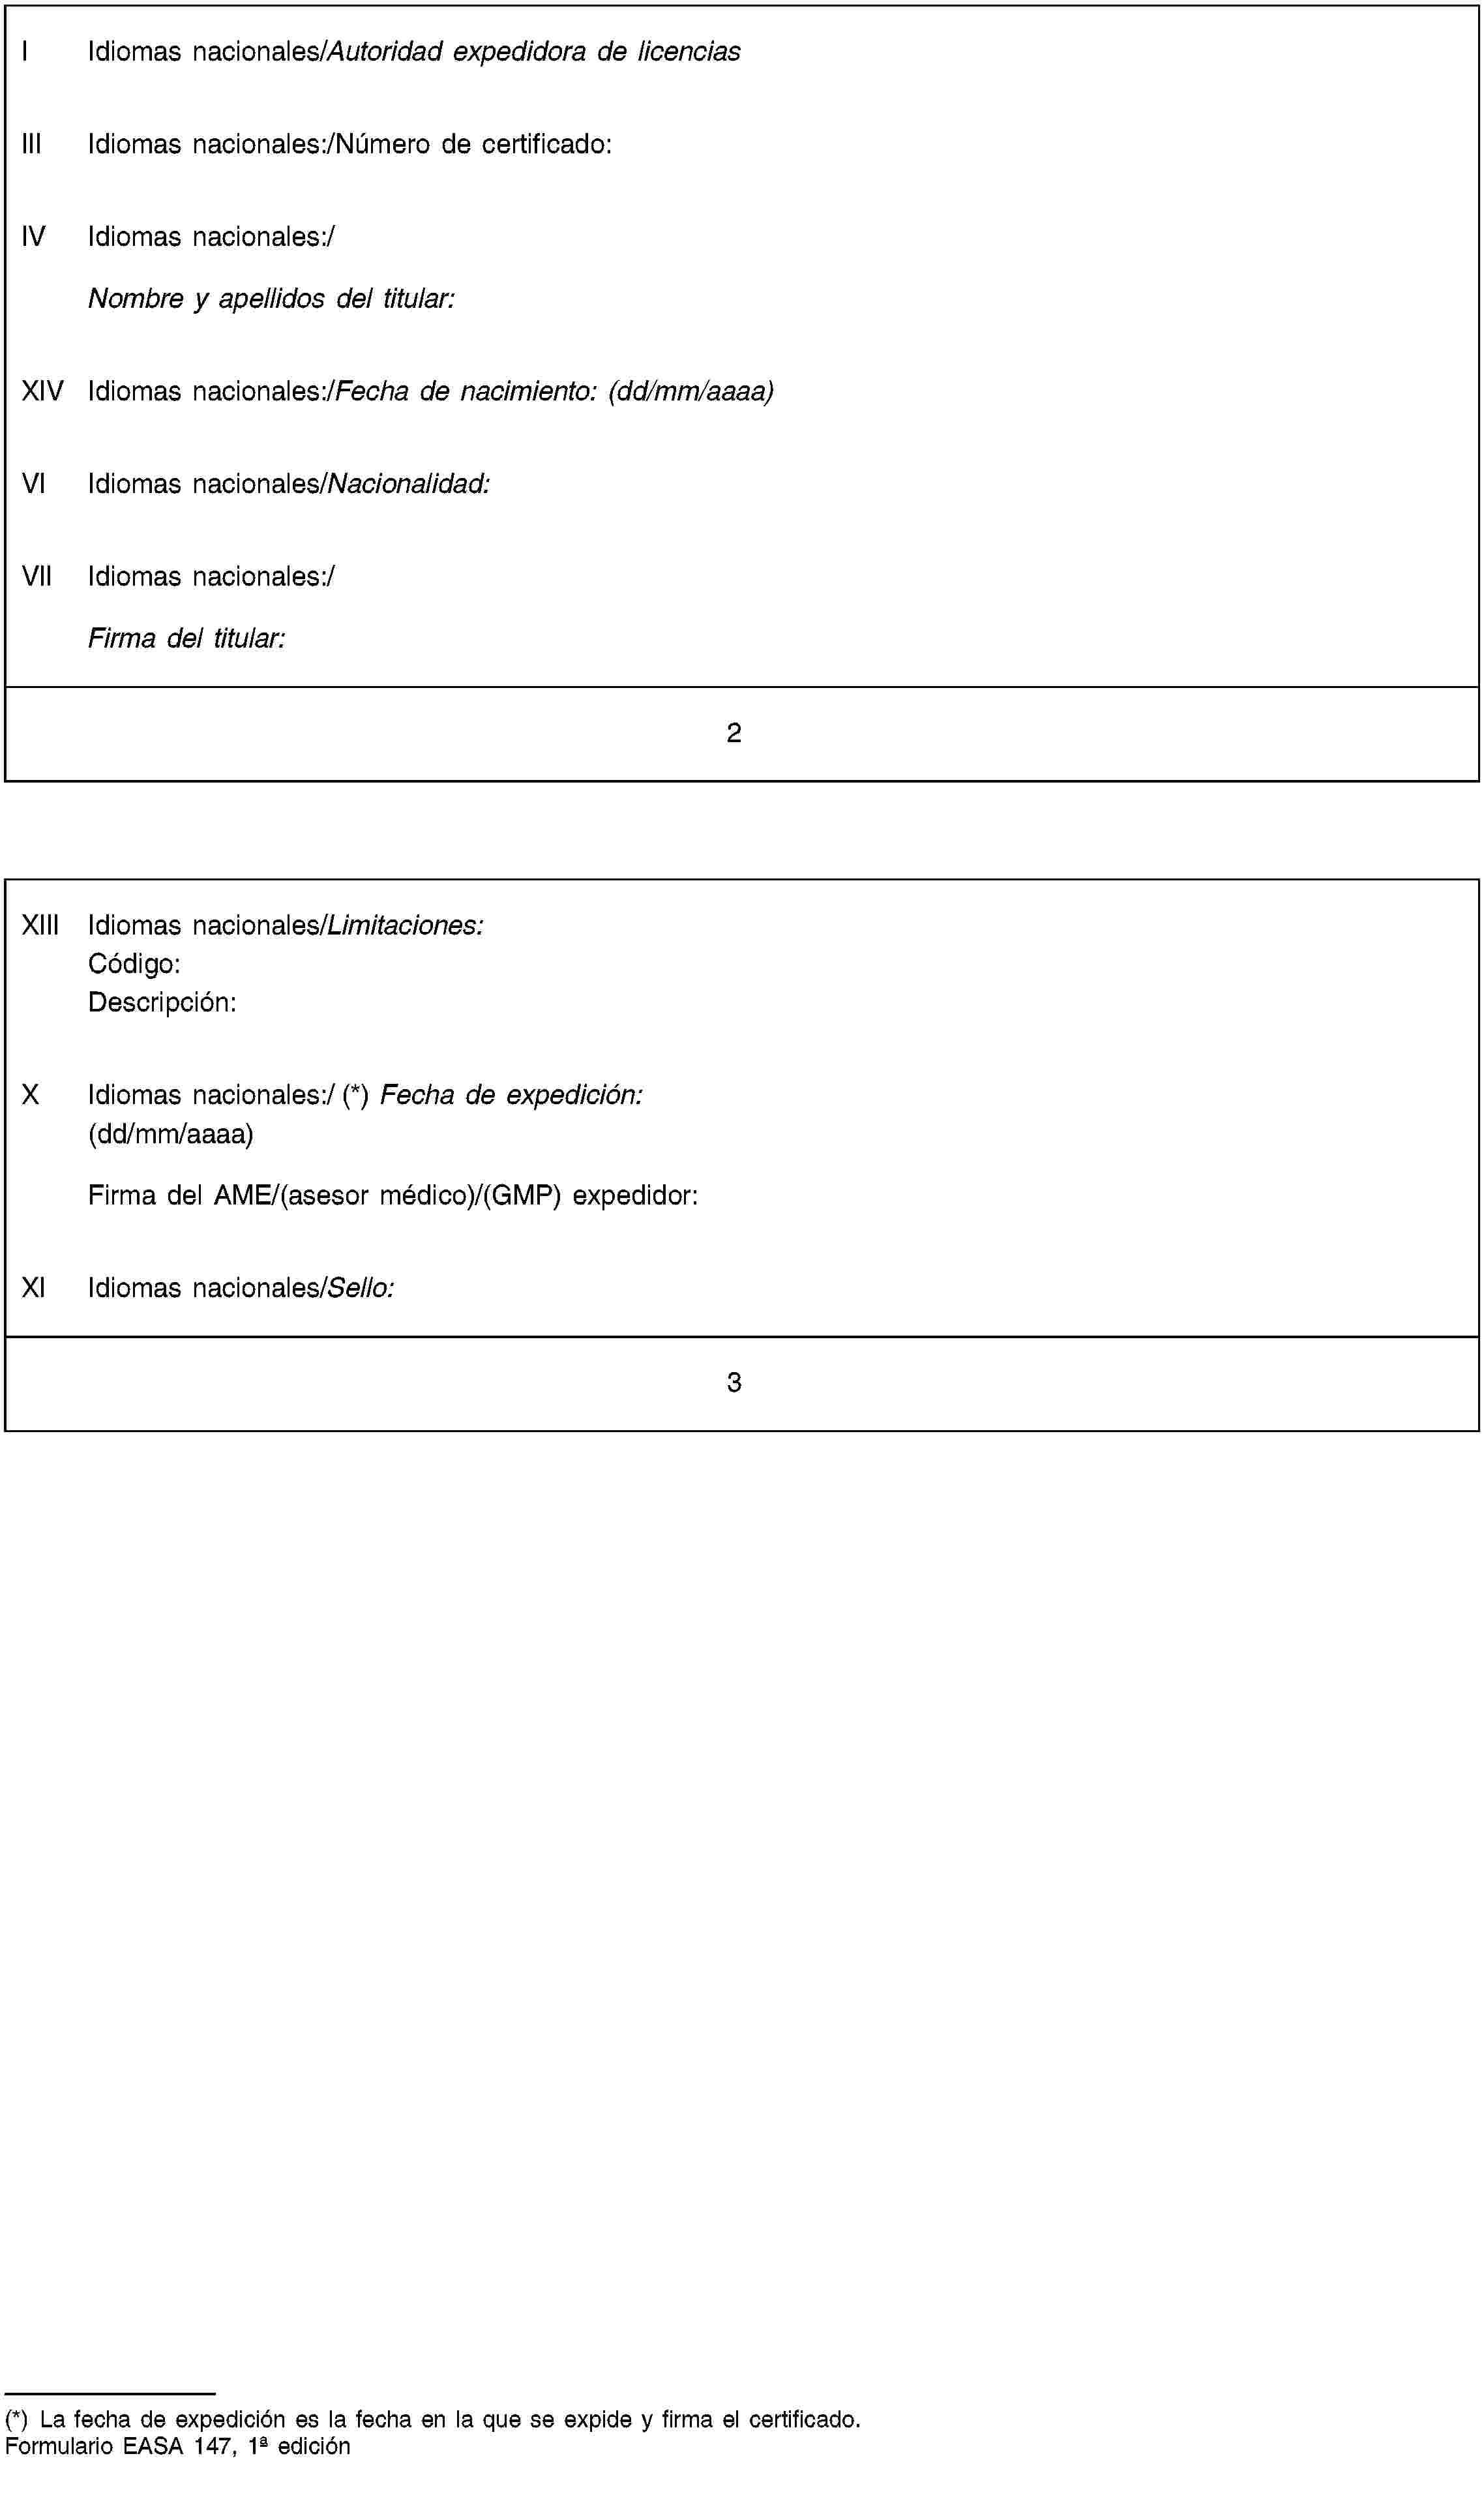 EUR-Lex - 02011R1178-20120408 - EN - EUR-Lex